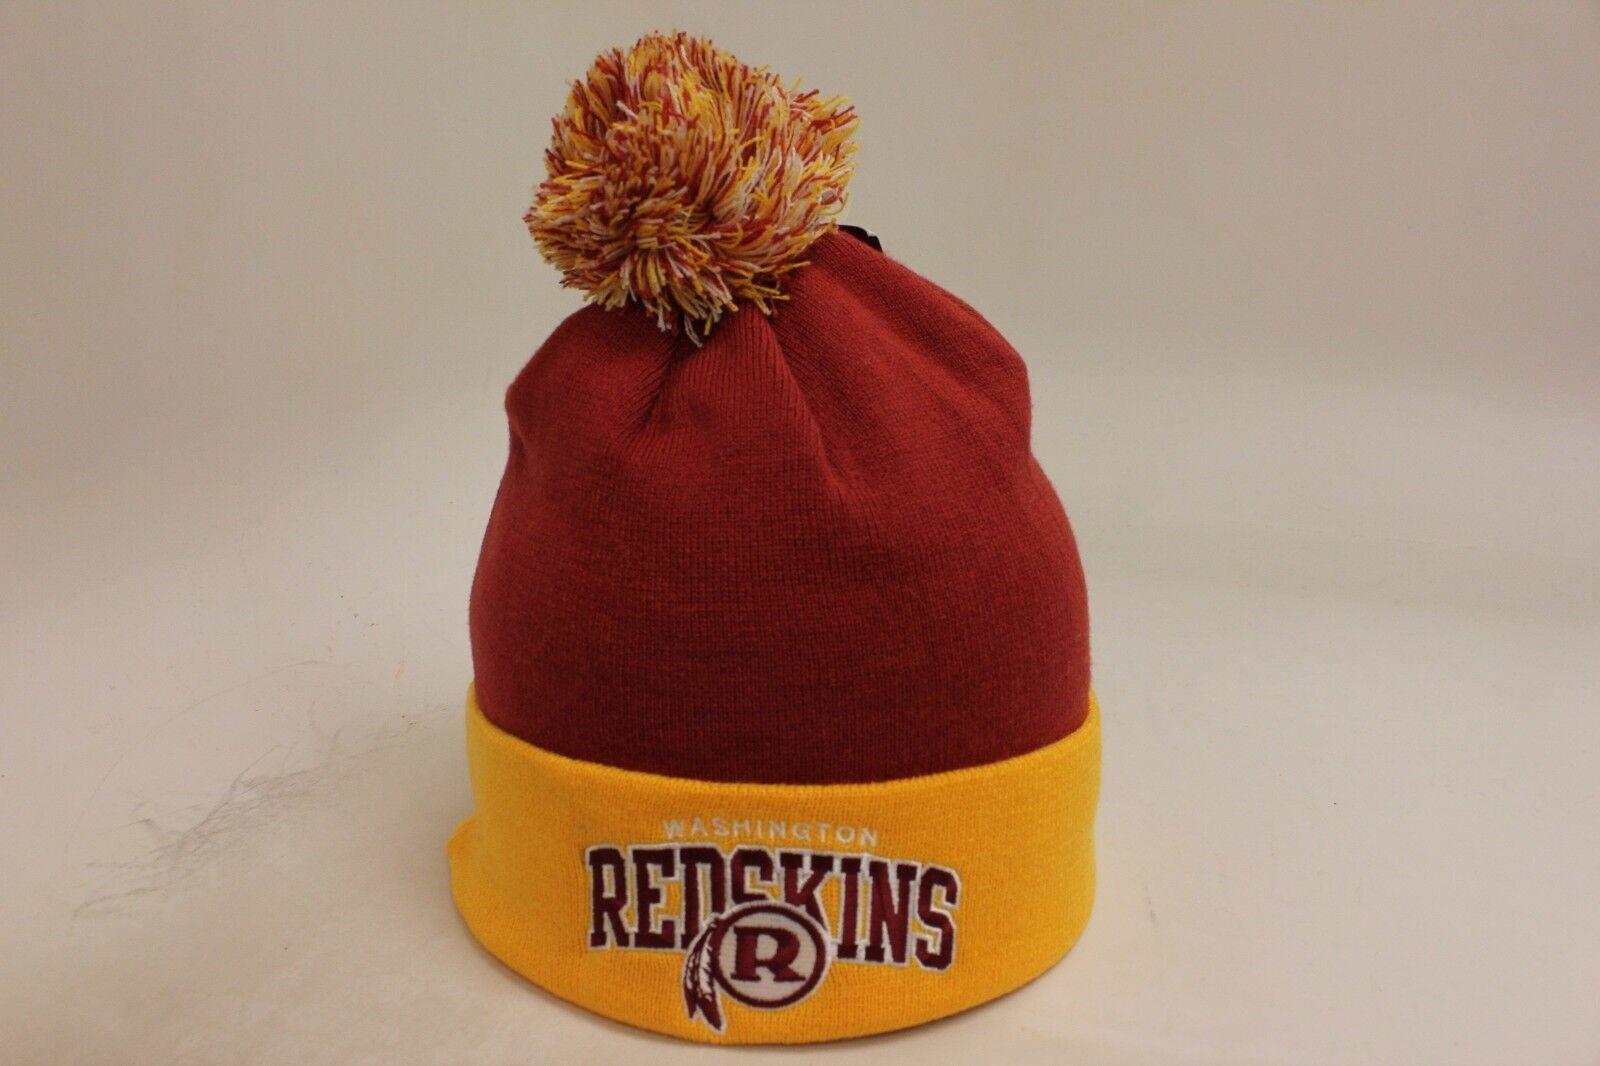 Washington Redskins Ness Burgundy/Yellow Block Letter Mitchell & Ness Redskins Pom Knit Skully d9335d